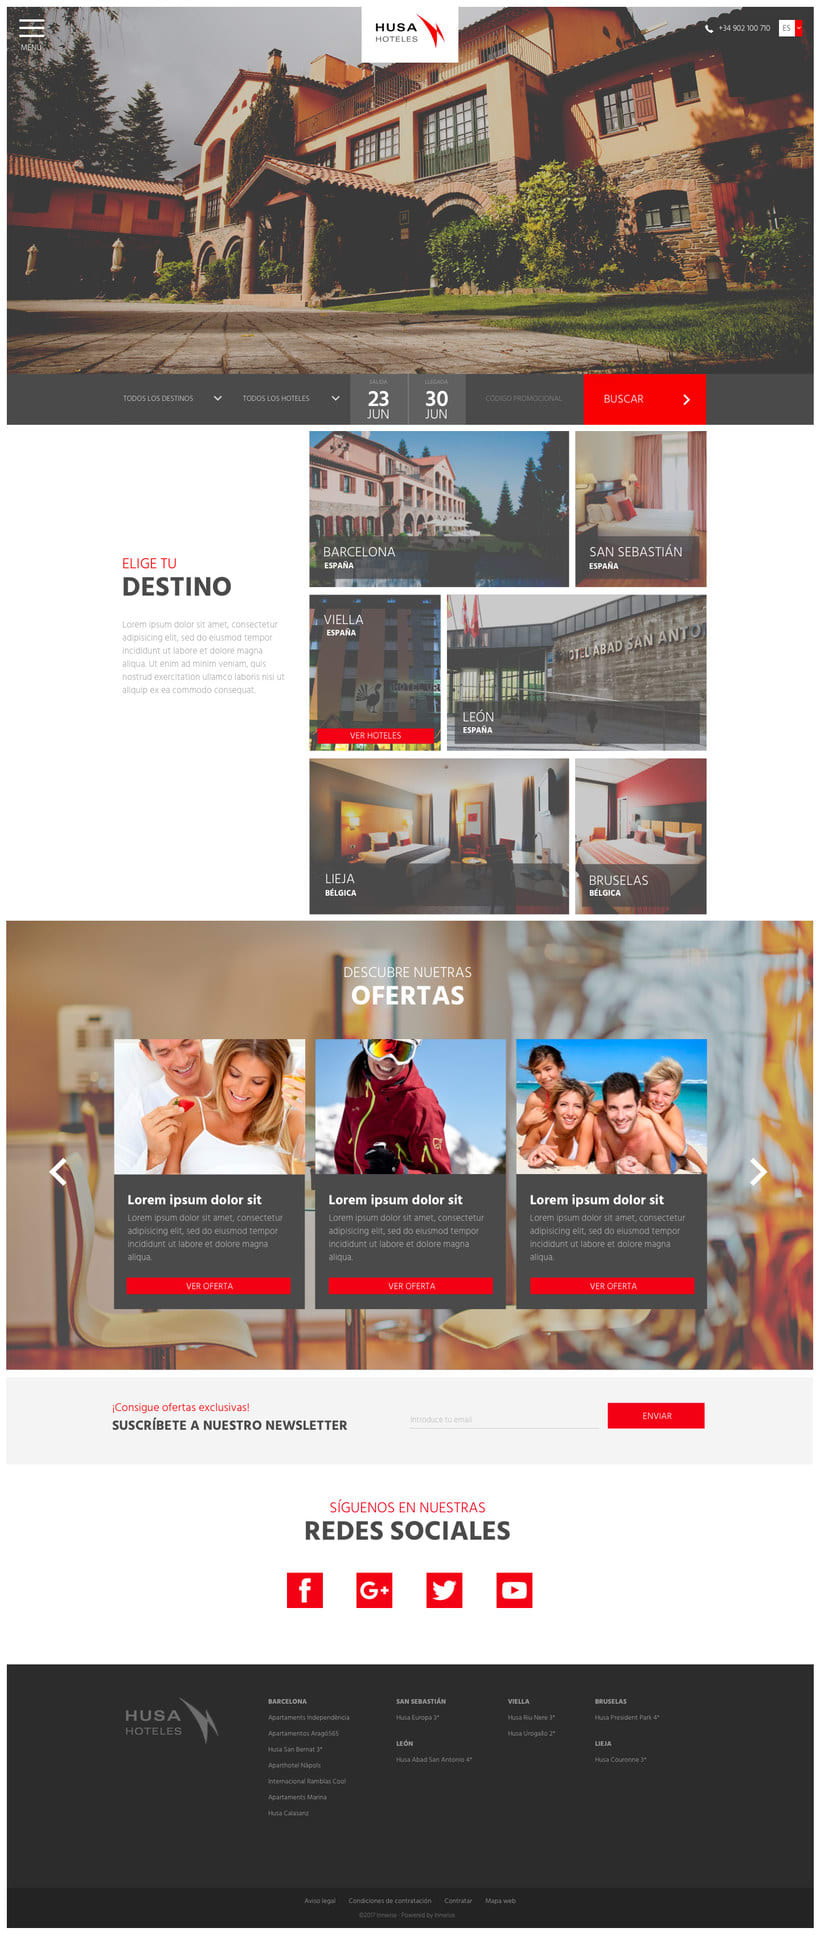 Web Husa Hoteles 0